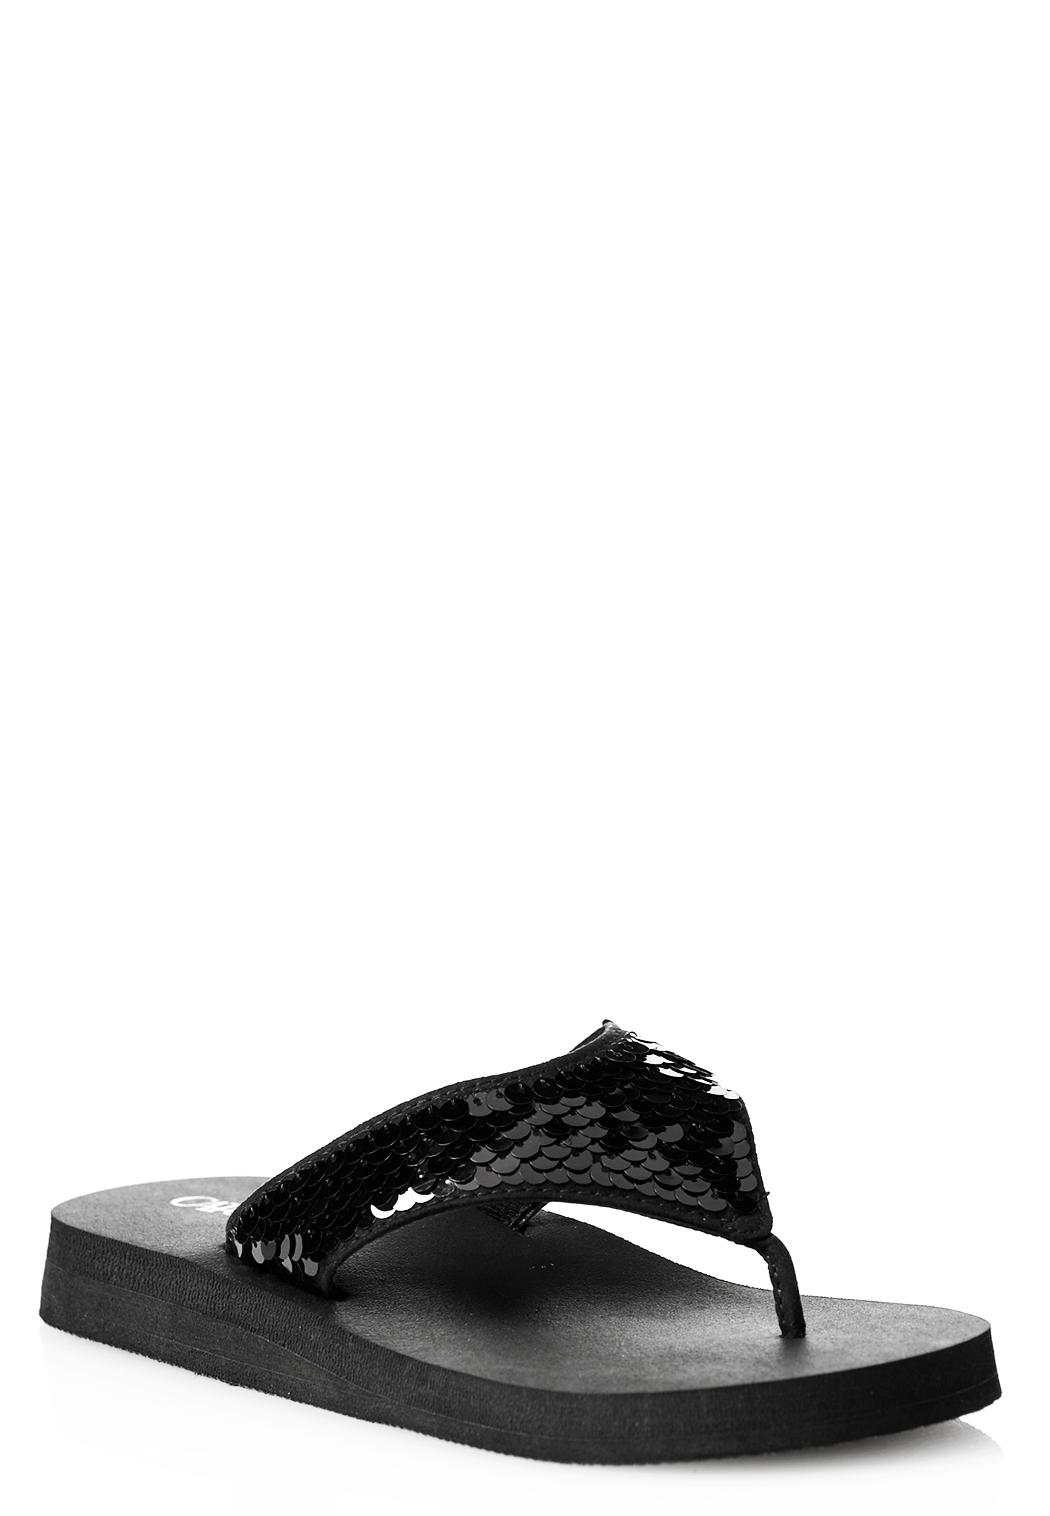 31f549a47 Sequin Platform Flip Flops Flip Flops Cato Fashions